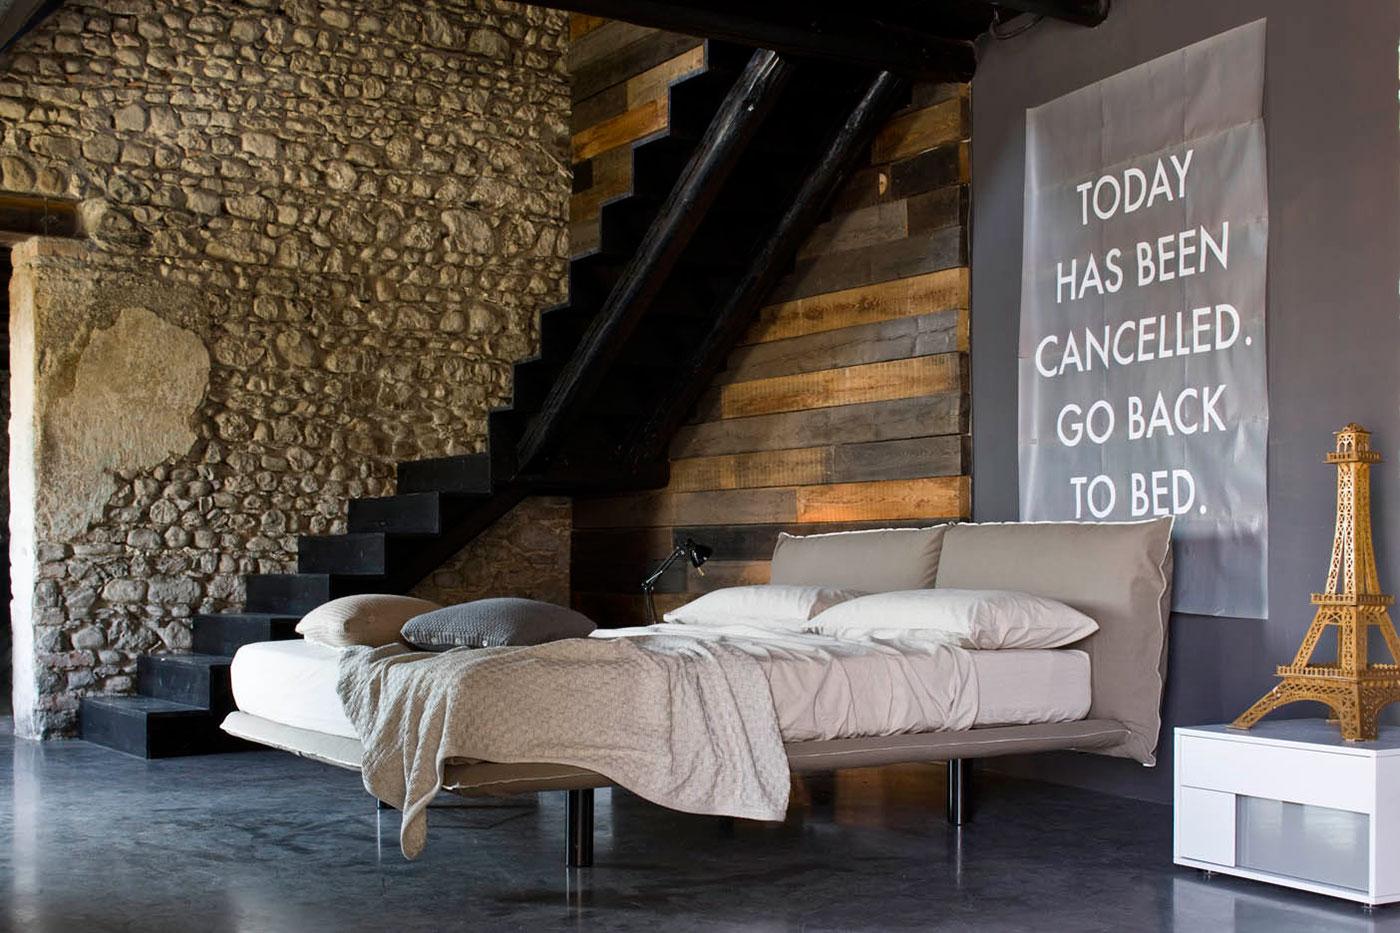 Convert casa arredamento interni divani for Arredatori d interni famosi